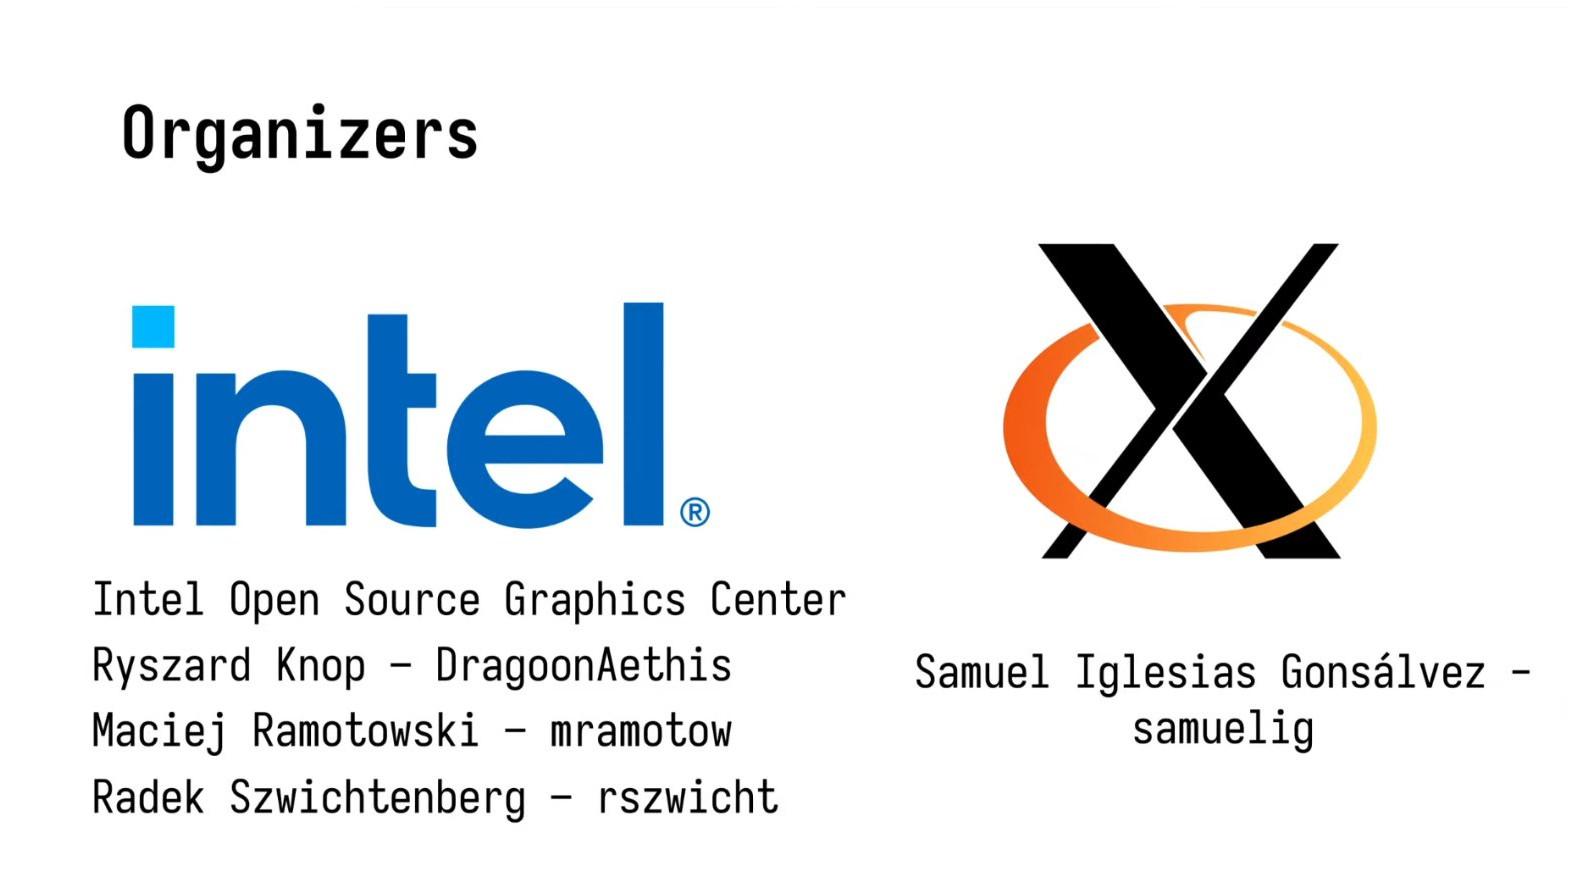 XDC 2021 Organizers